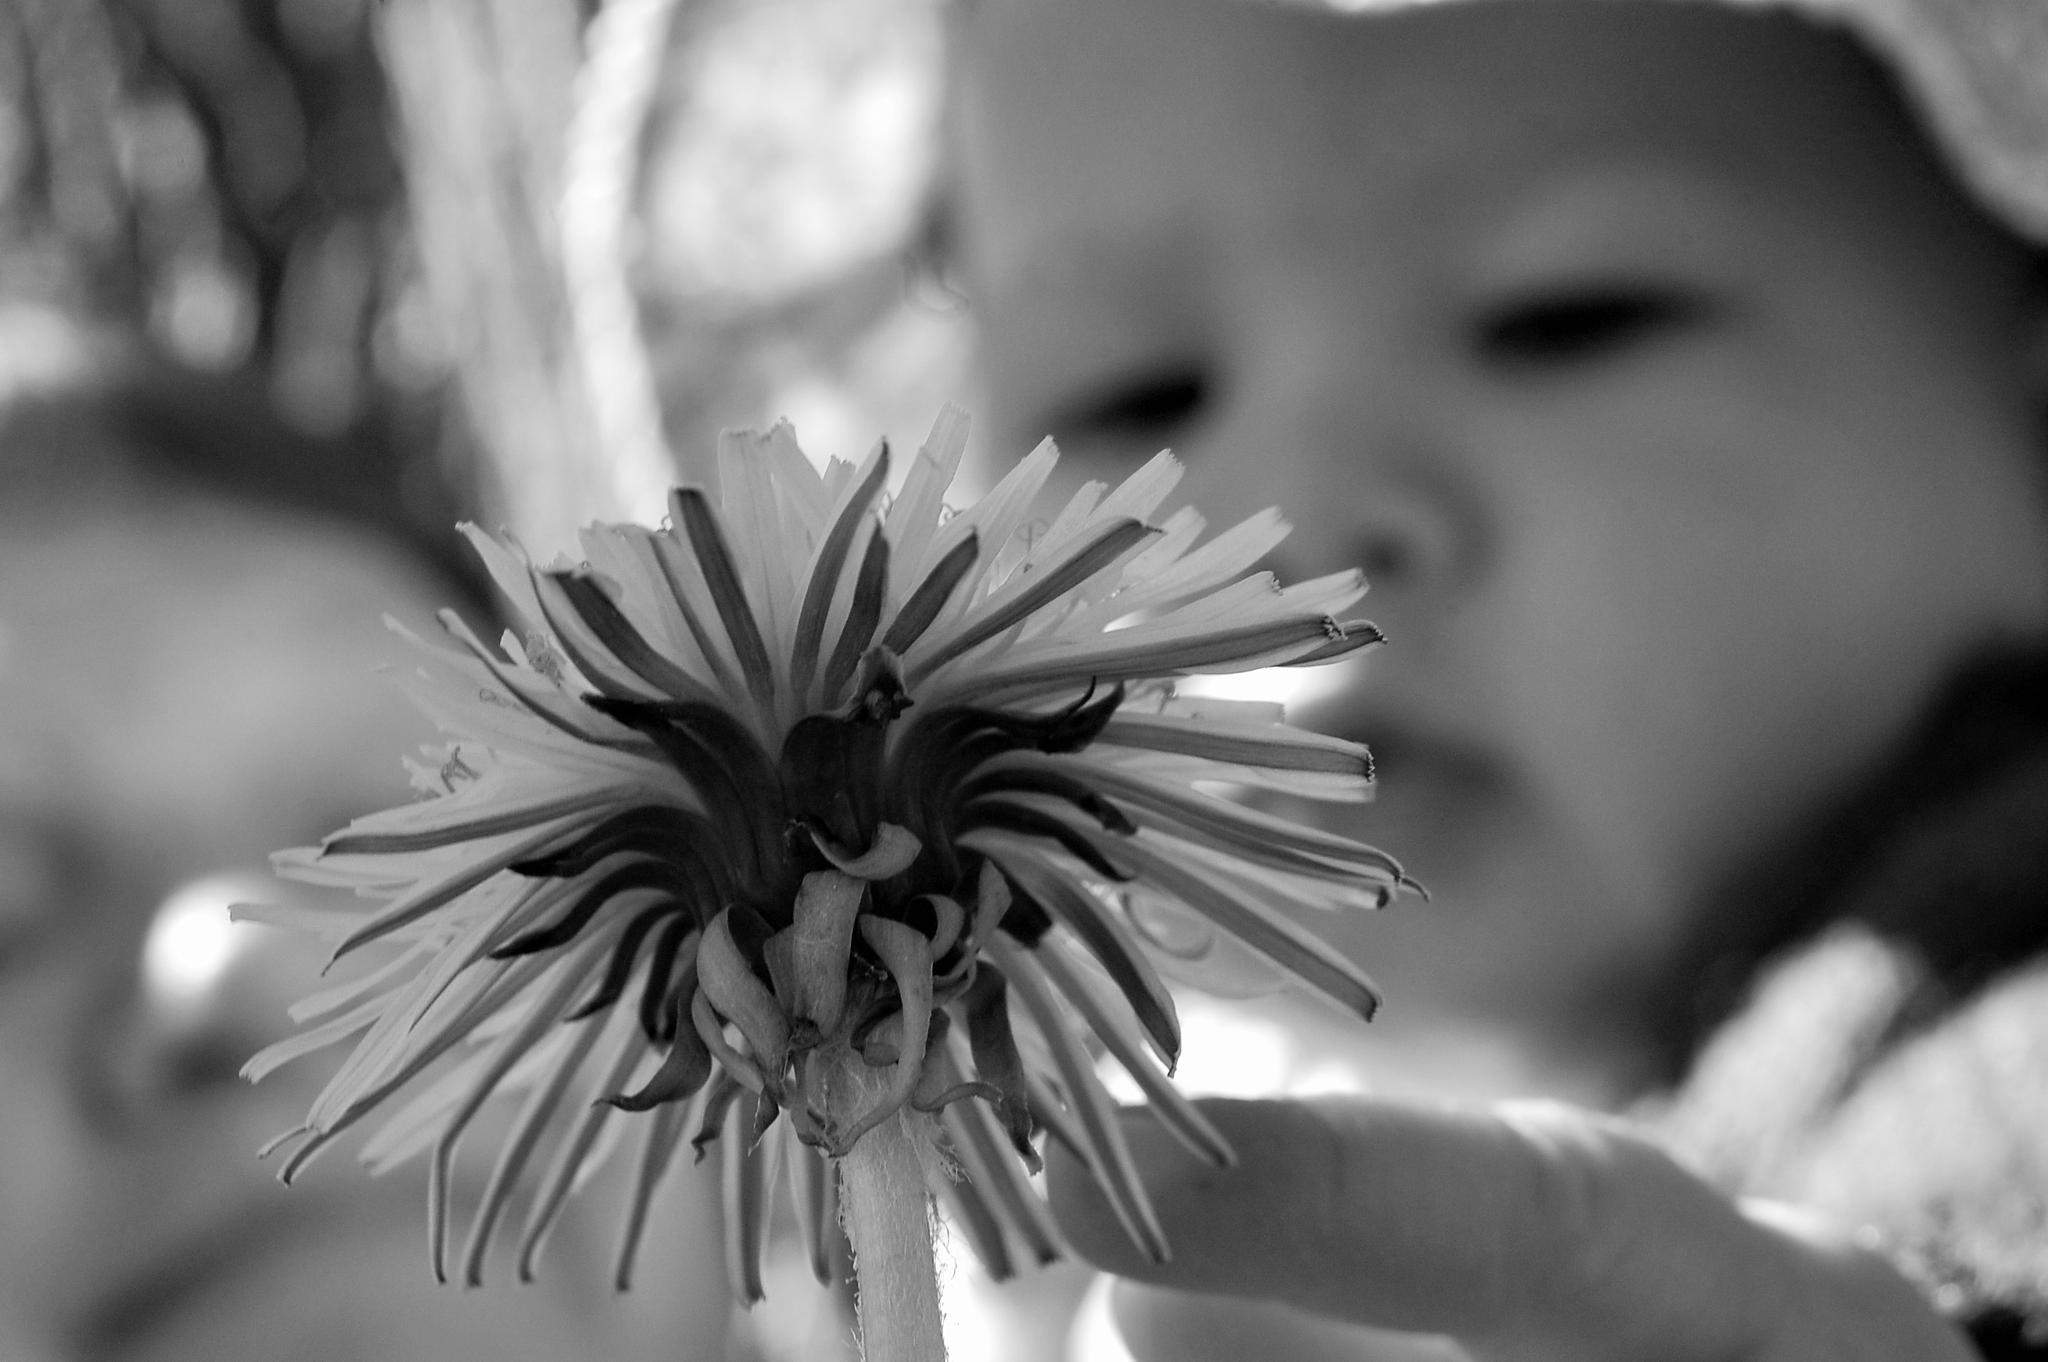 Untitled by lillemor.ekstrom ek